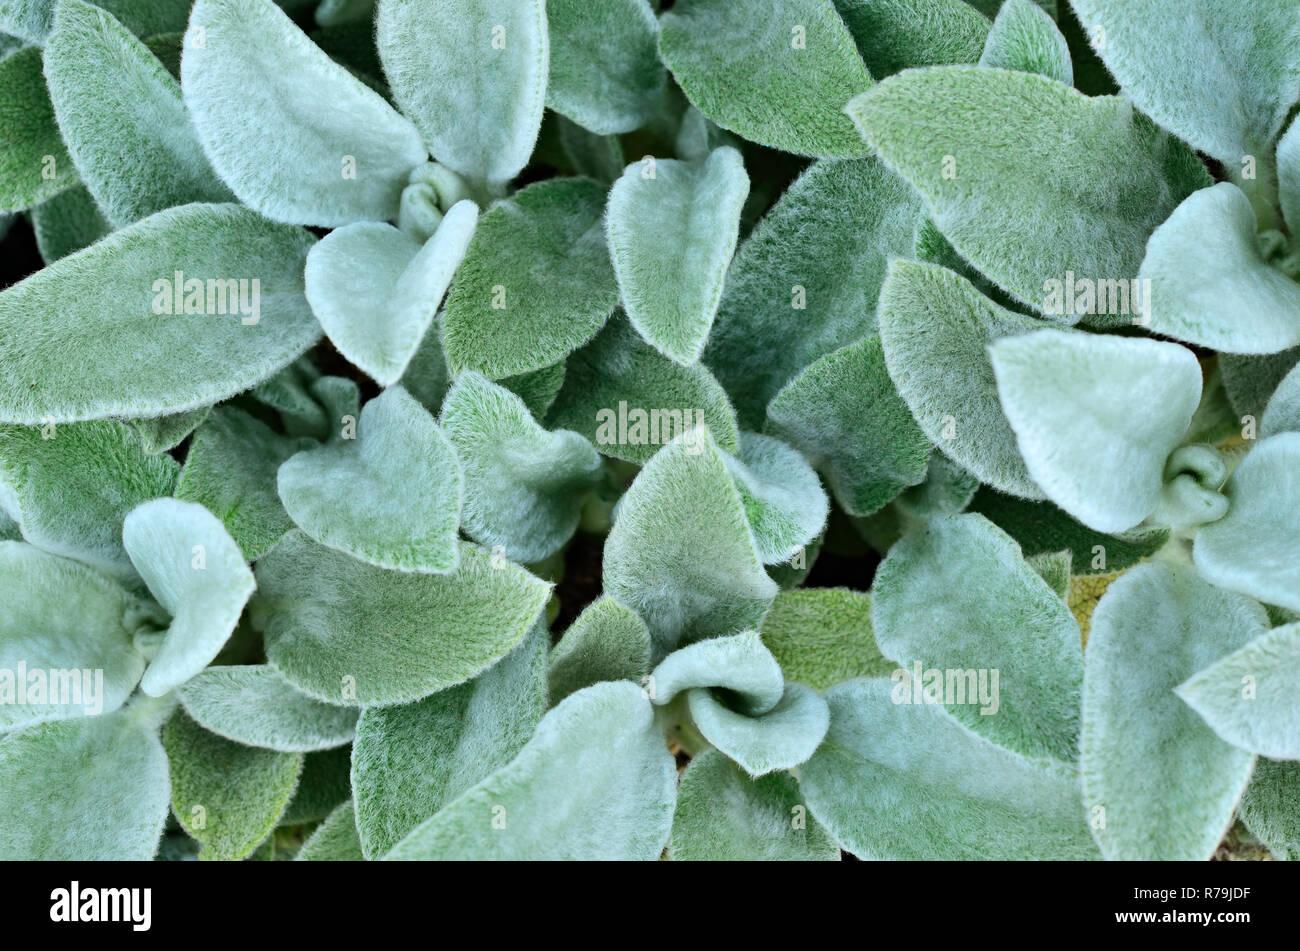 Hairy leaves of garden plants Stock Photo